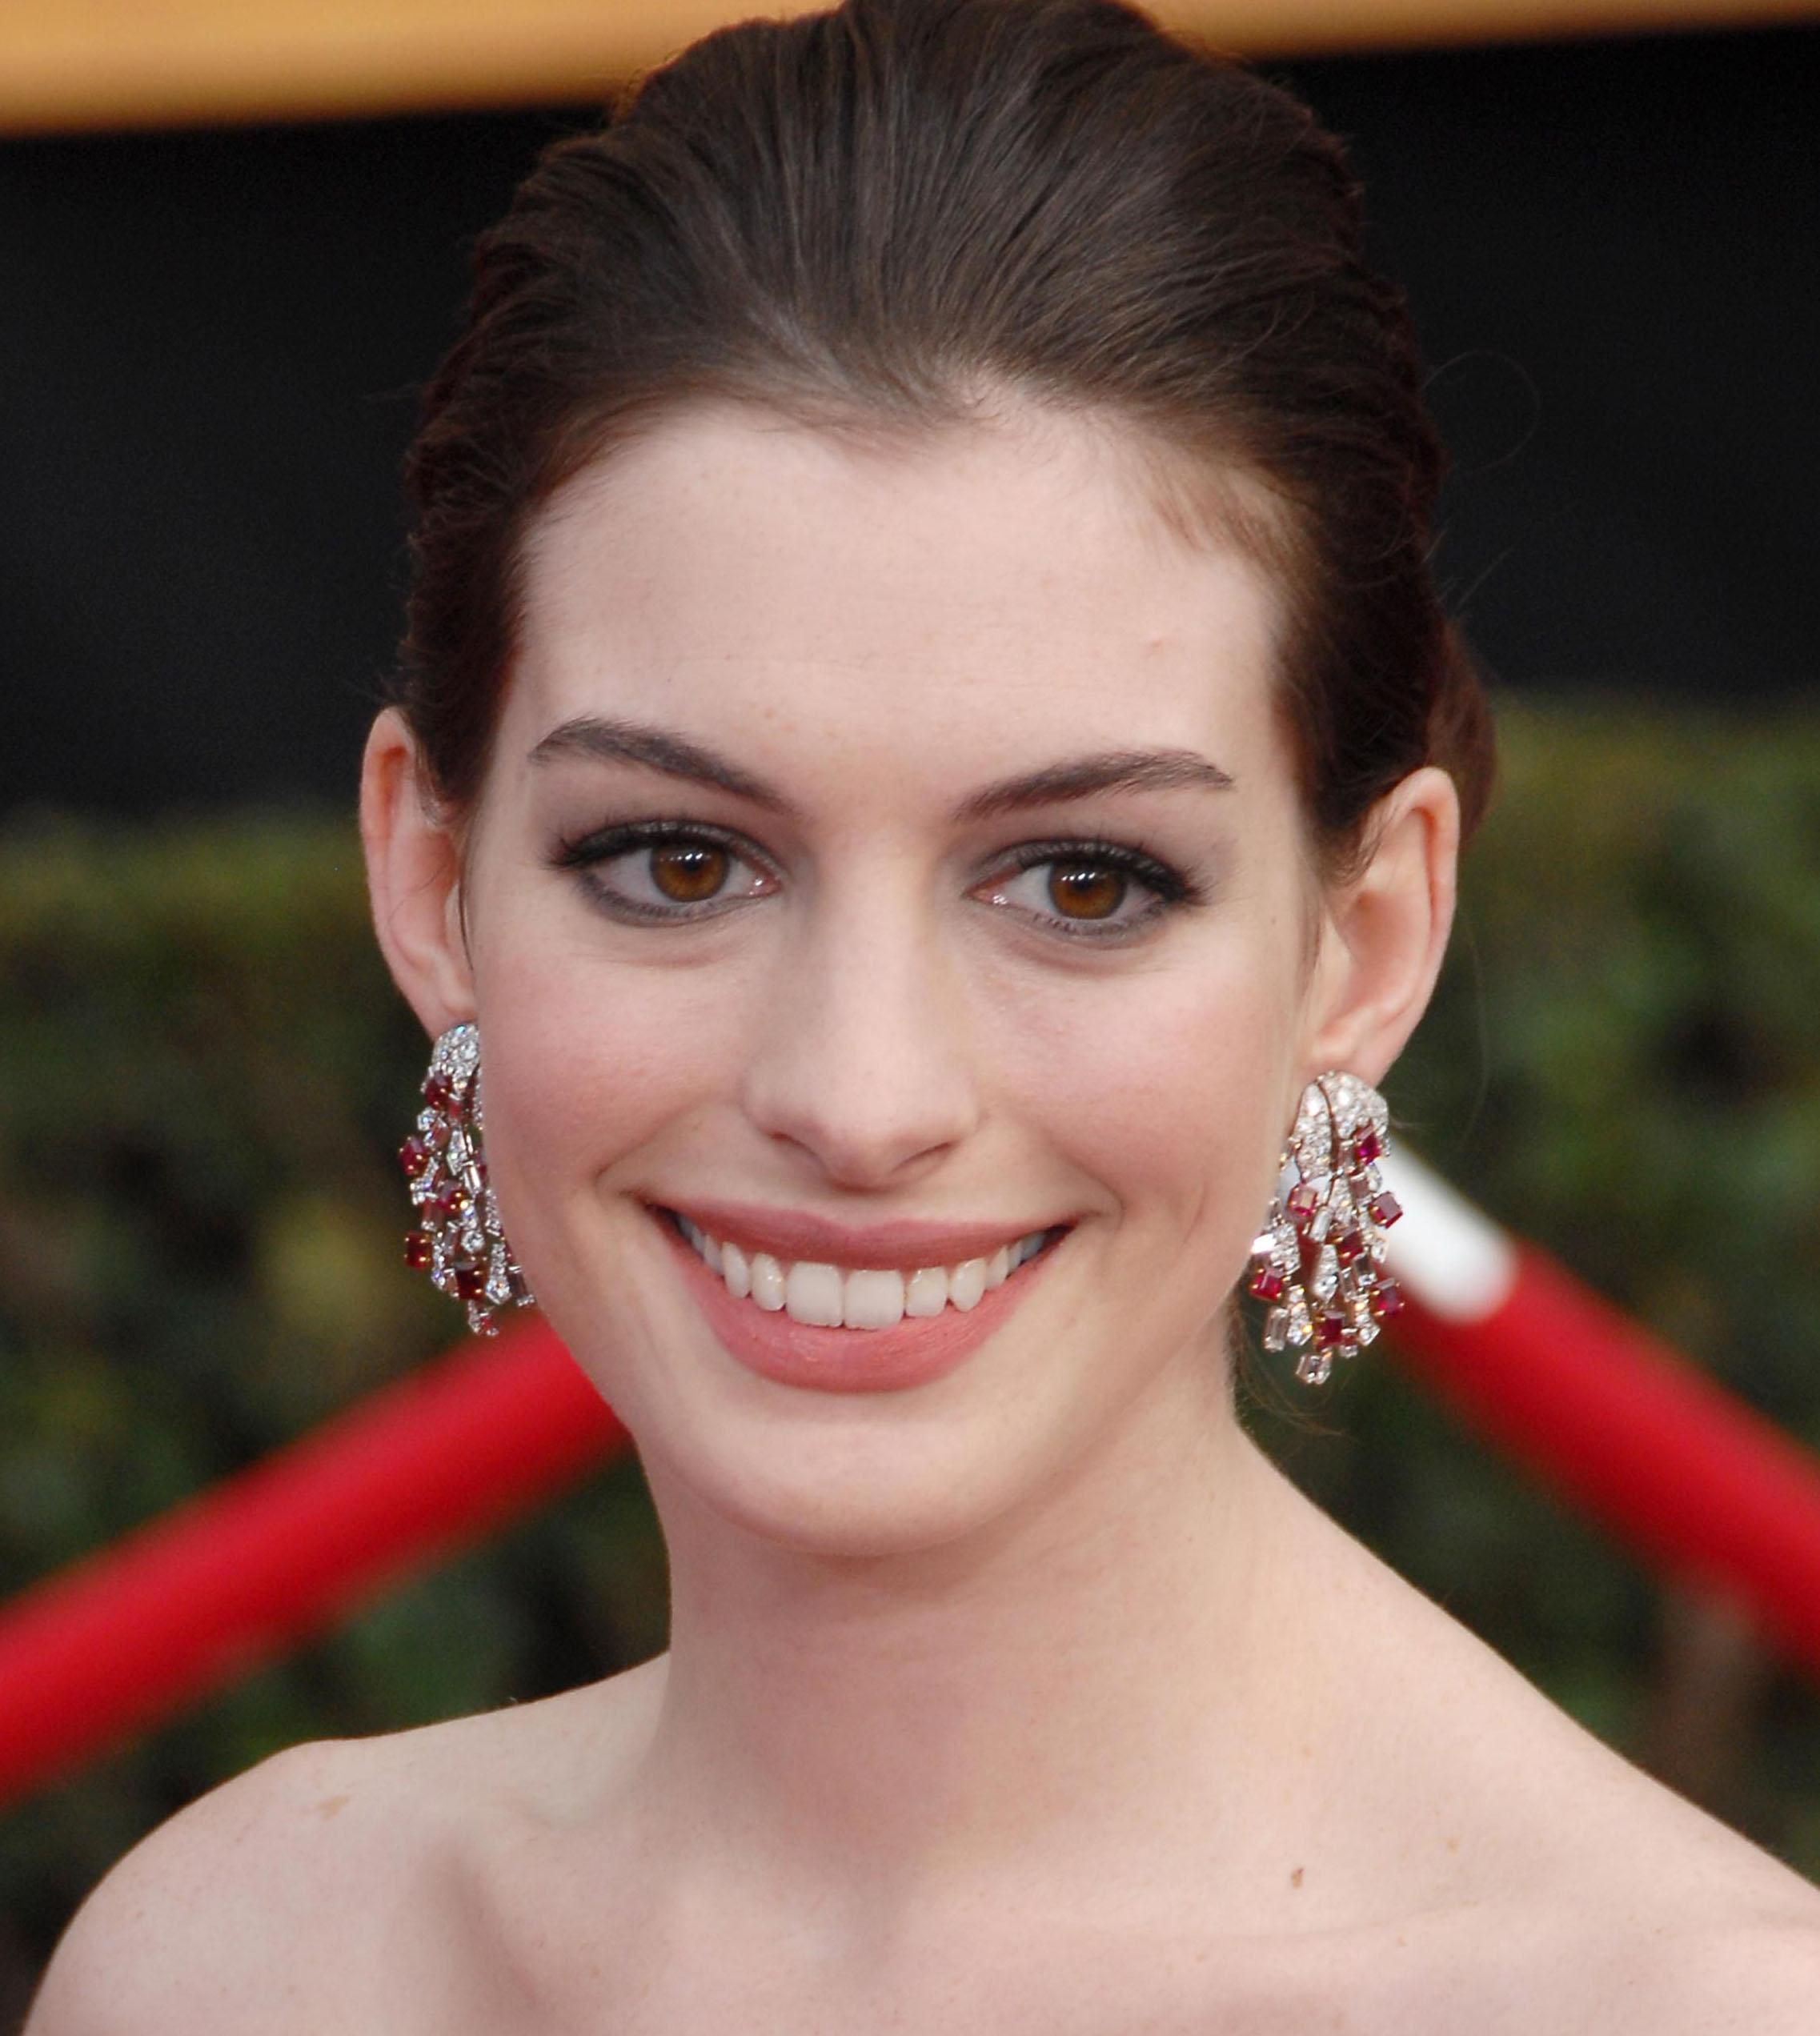 Anne Hathaway Kind: SAG Awards Red Carpet Jewelry: Gemstone Earrings